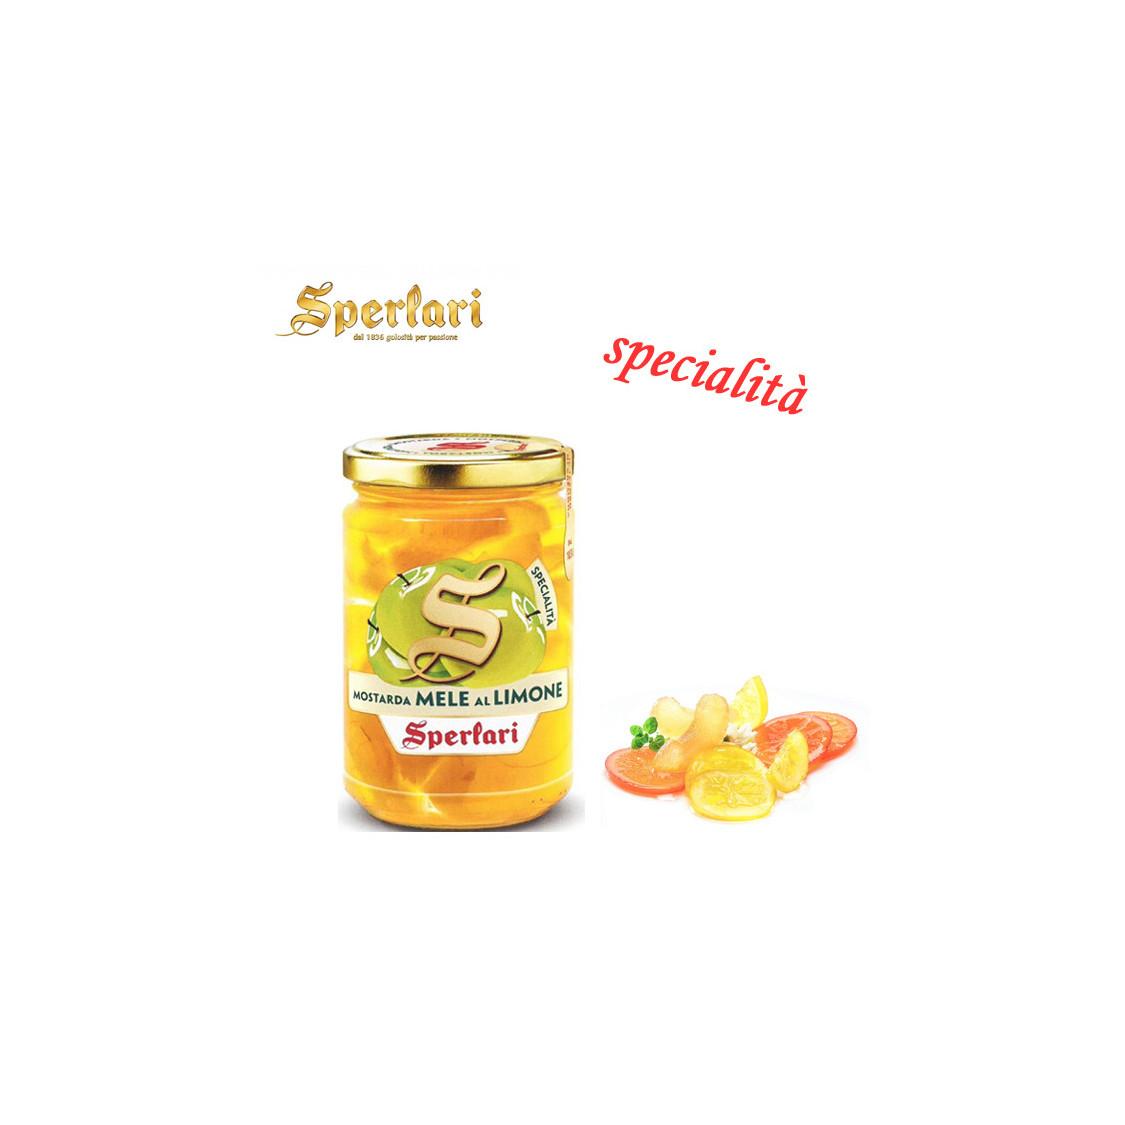 SPERLARI Mostarda di Mele al Limone - 380 gr.